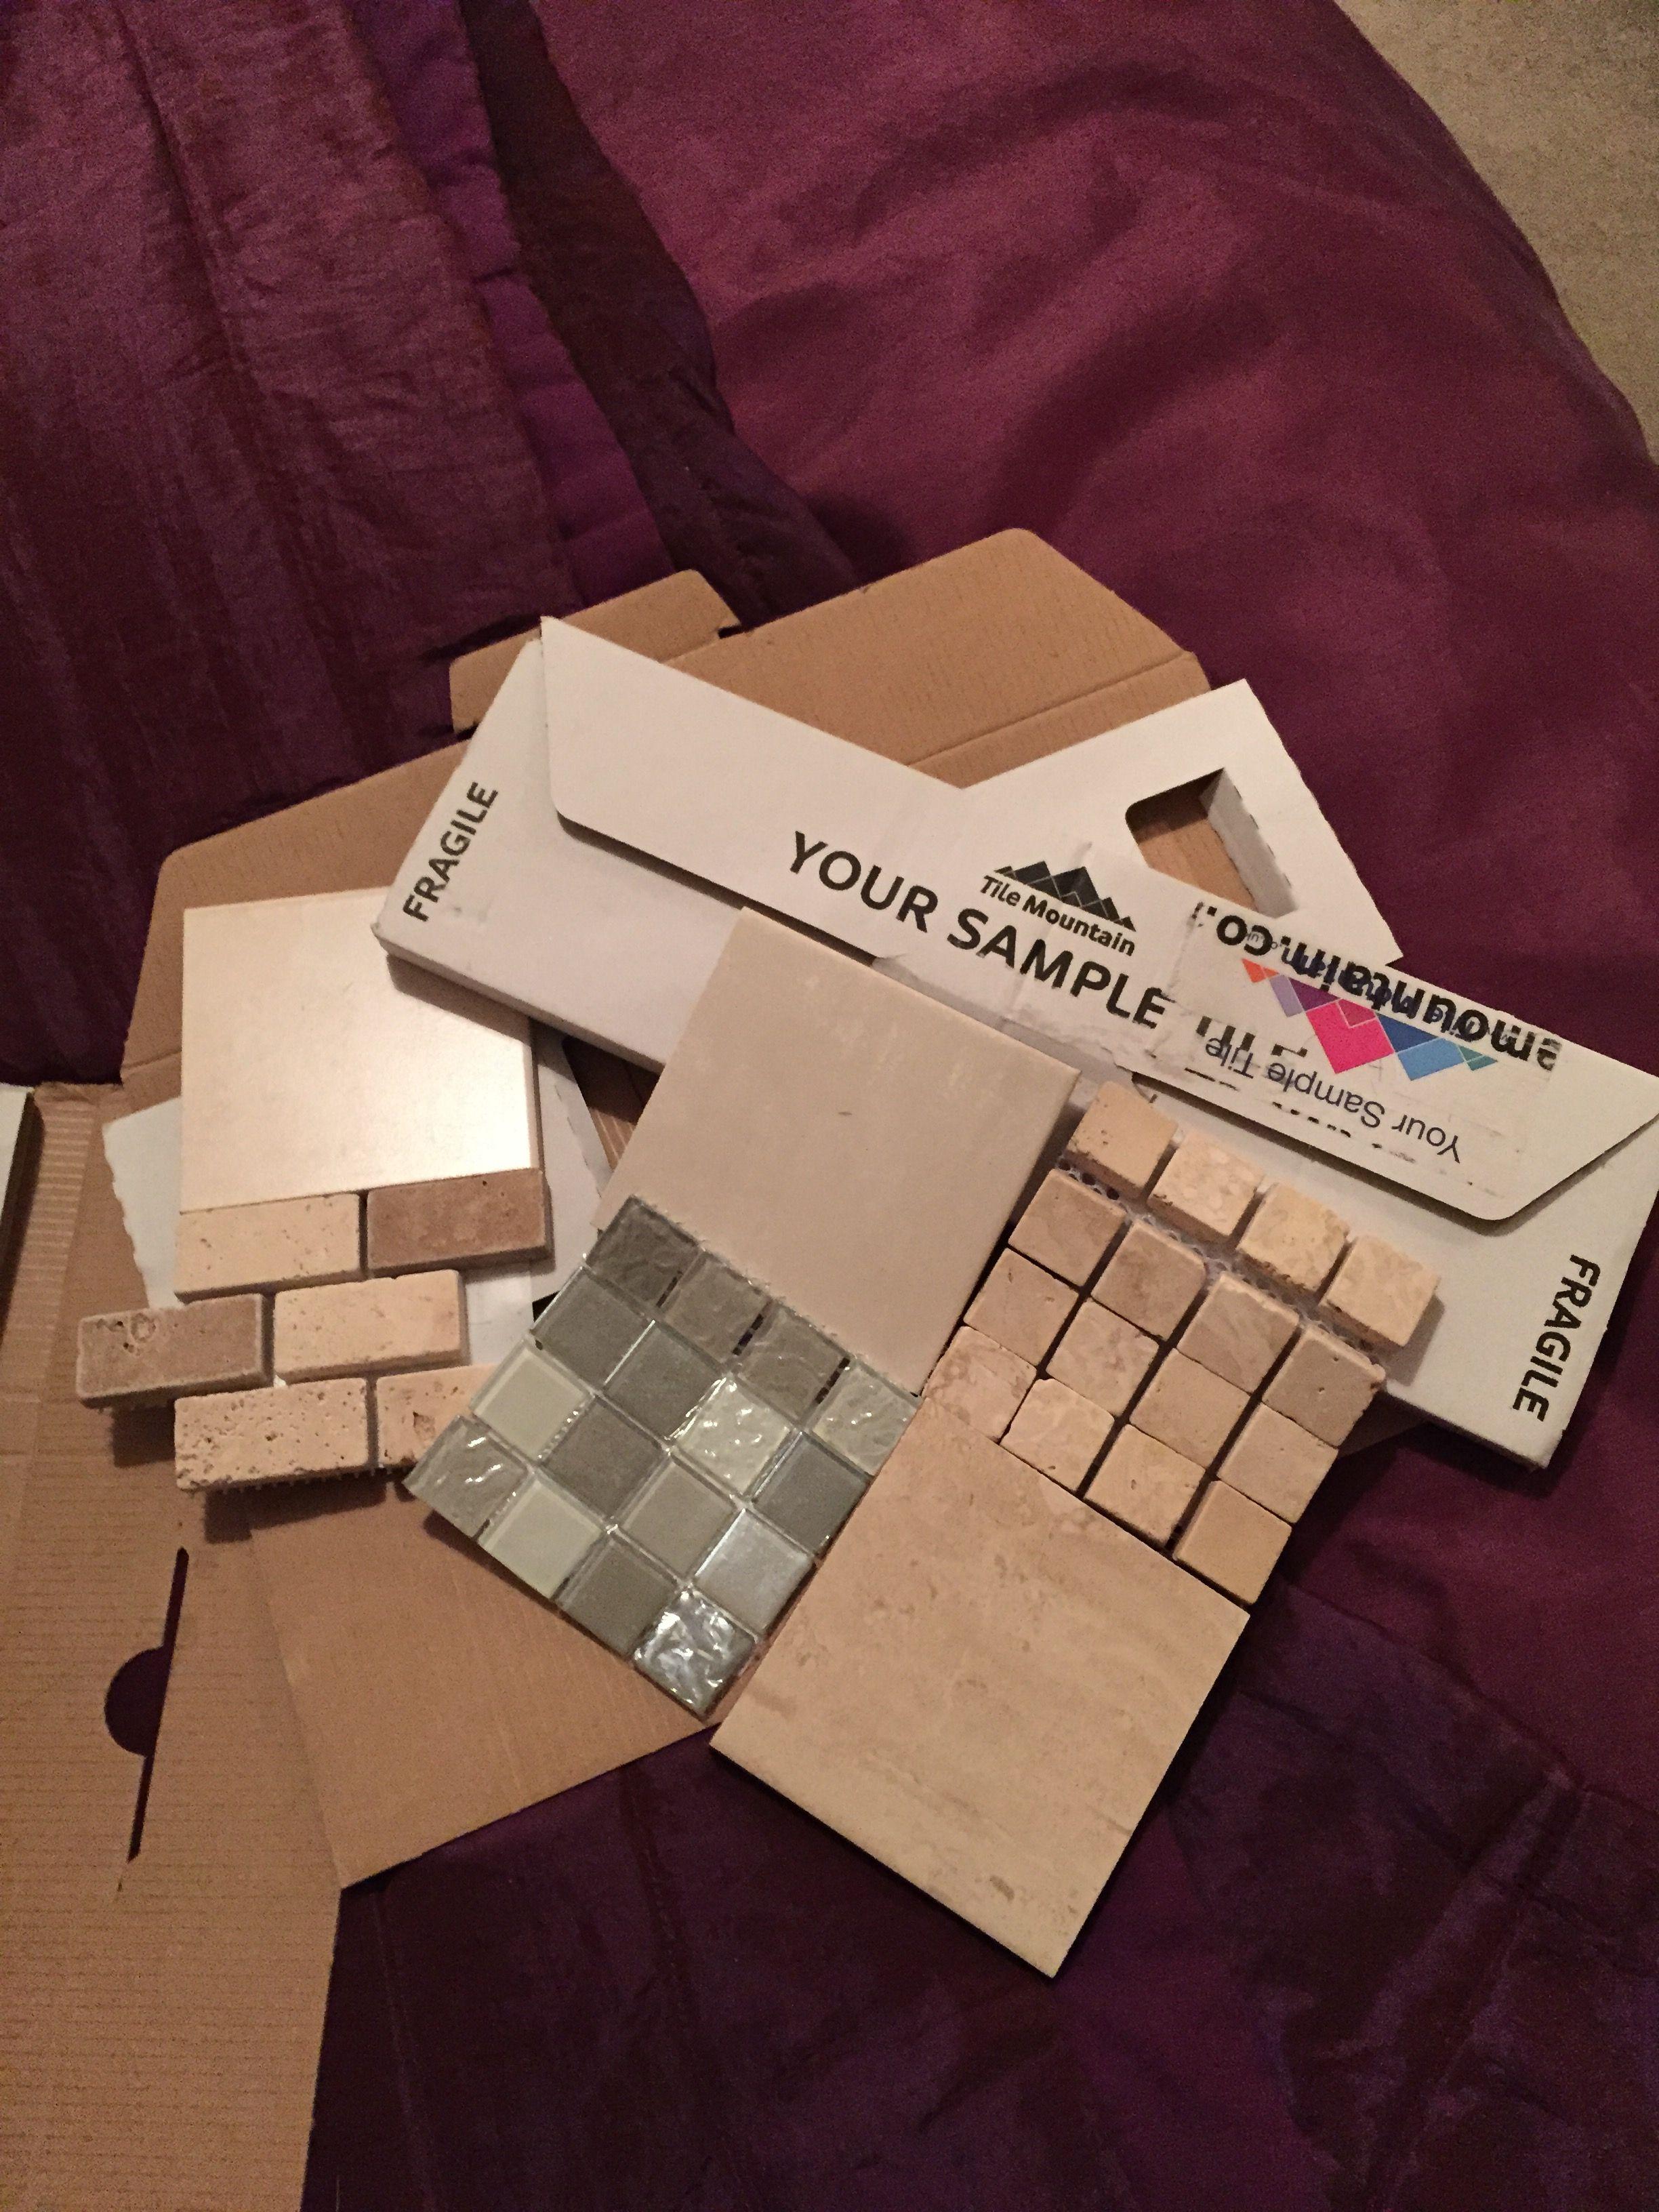 #shrewdlifeblog #bathroom #tiles #tilemountain #tiles #affordable #renovation #decorating #homeimprovement #housedecor